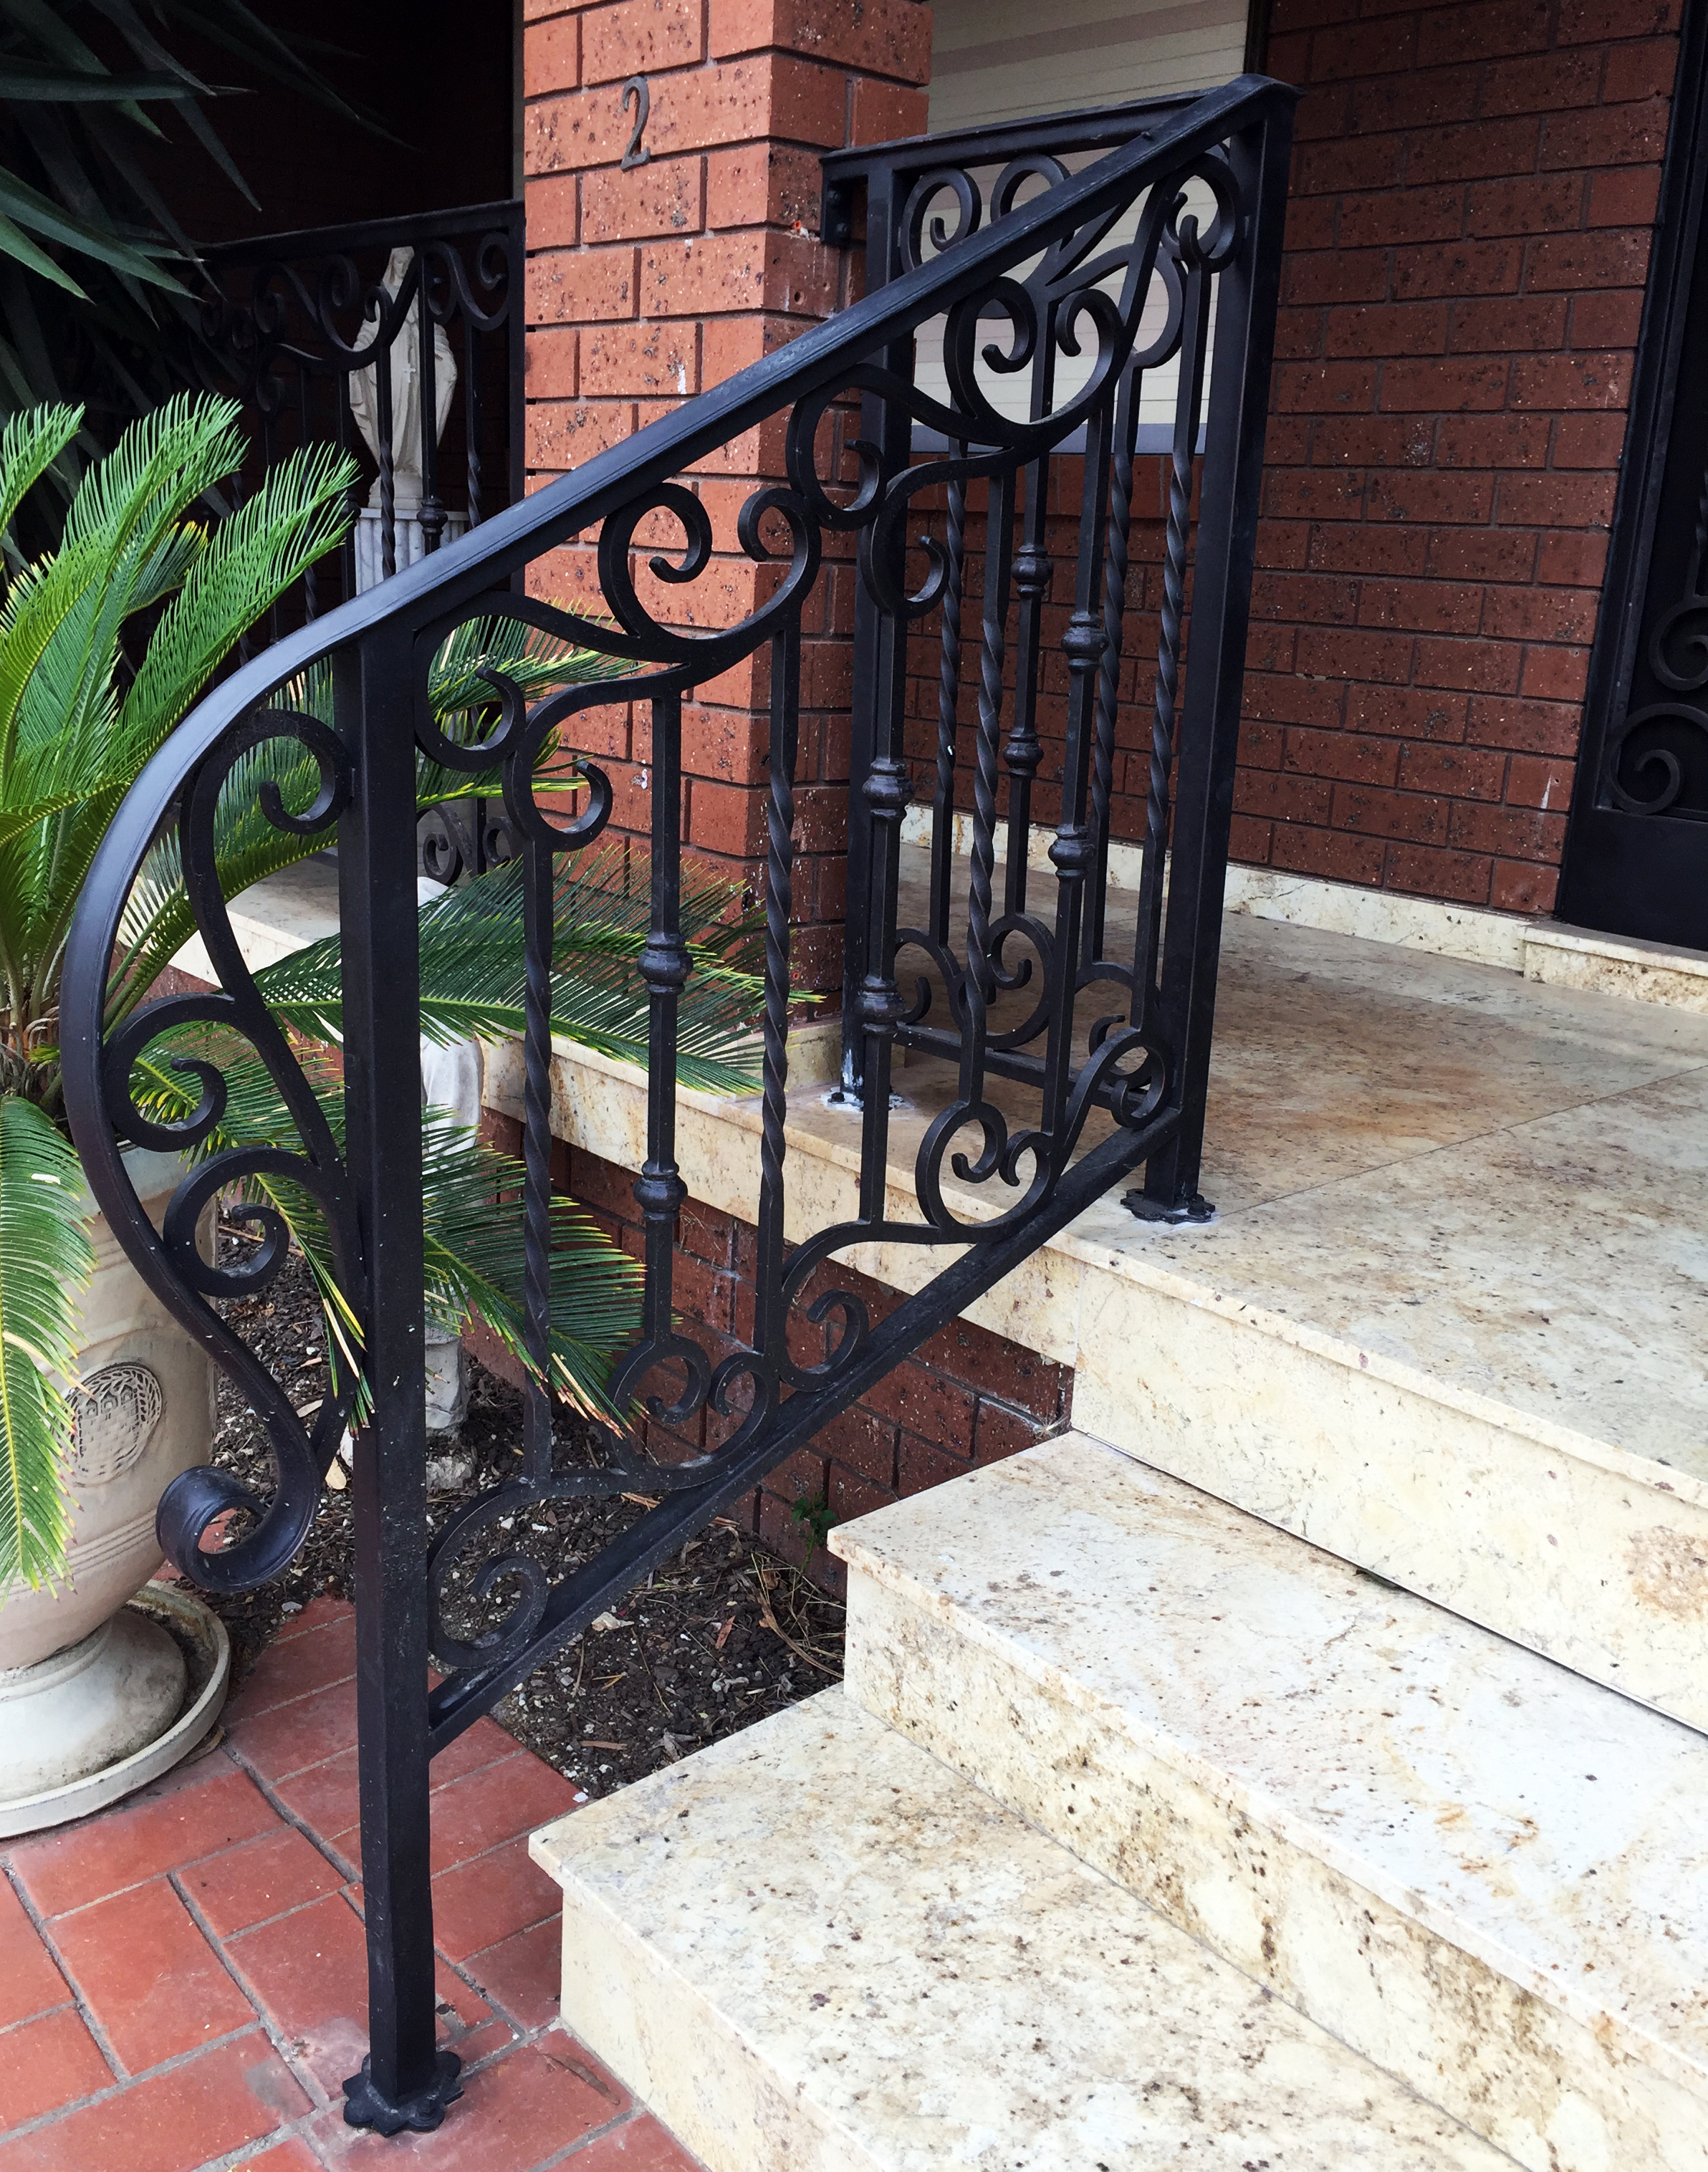 Wrought Iron Railings | Adoore Iron Designs.